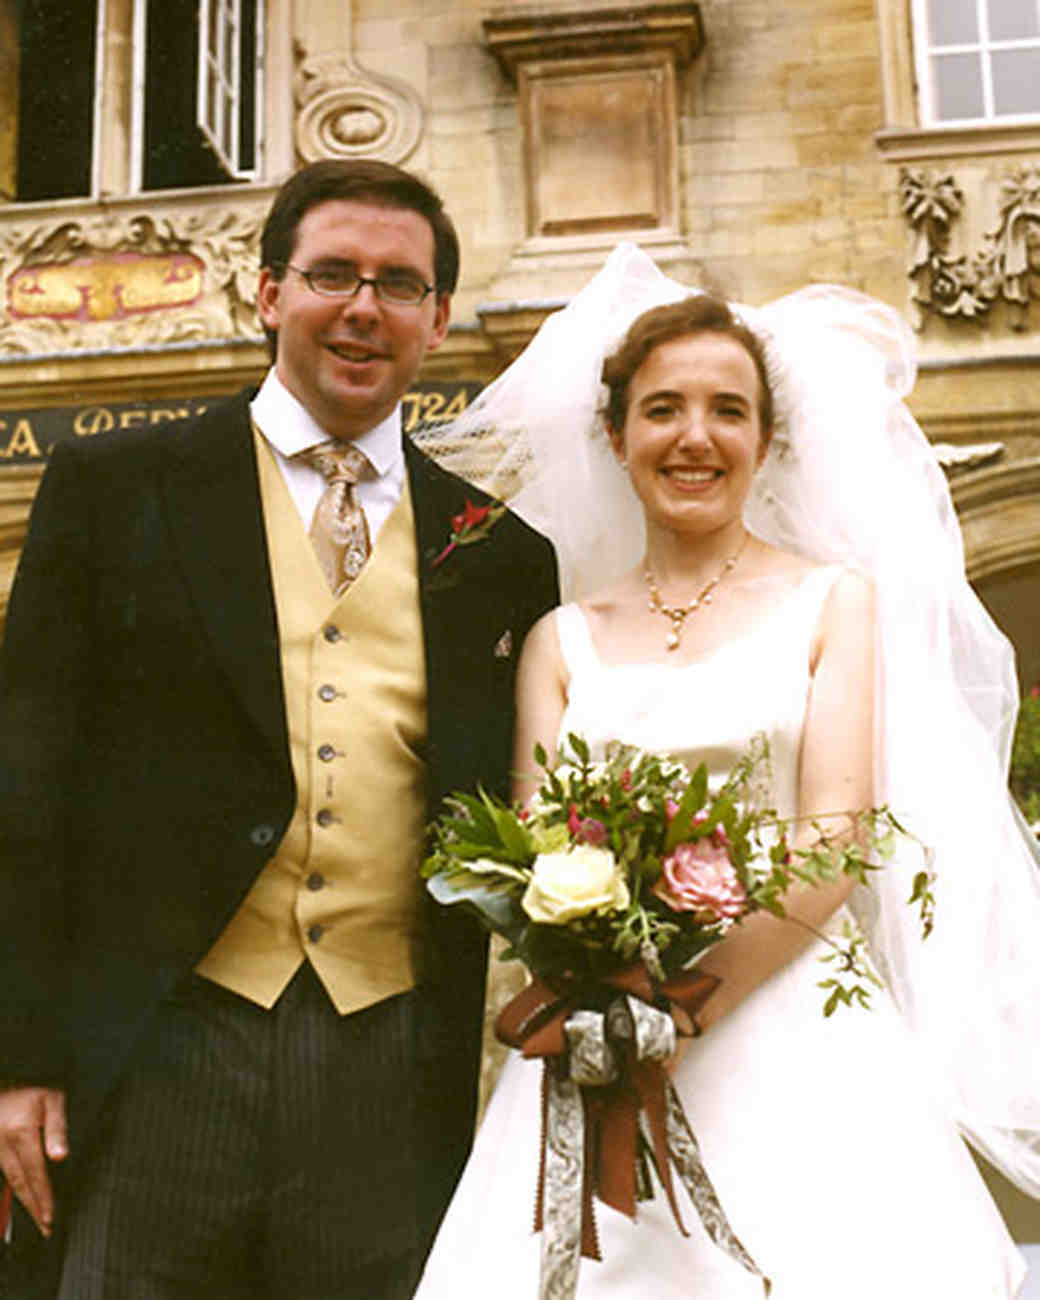 A Traditional Destination Wedding in Cambridge, England